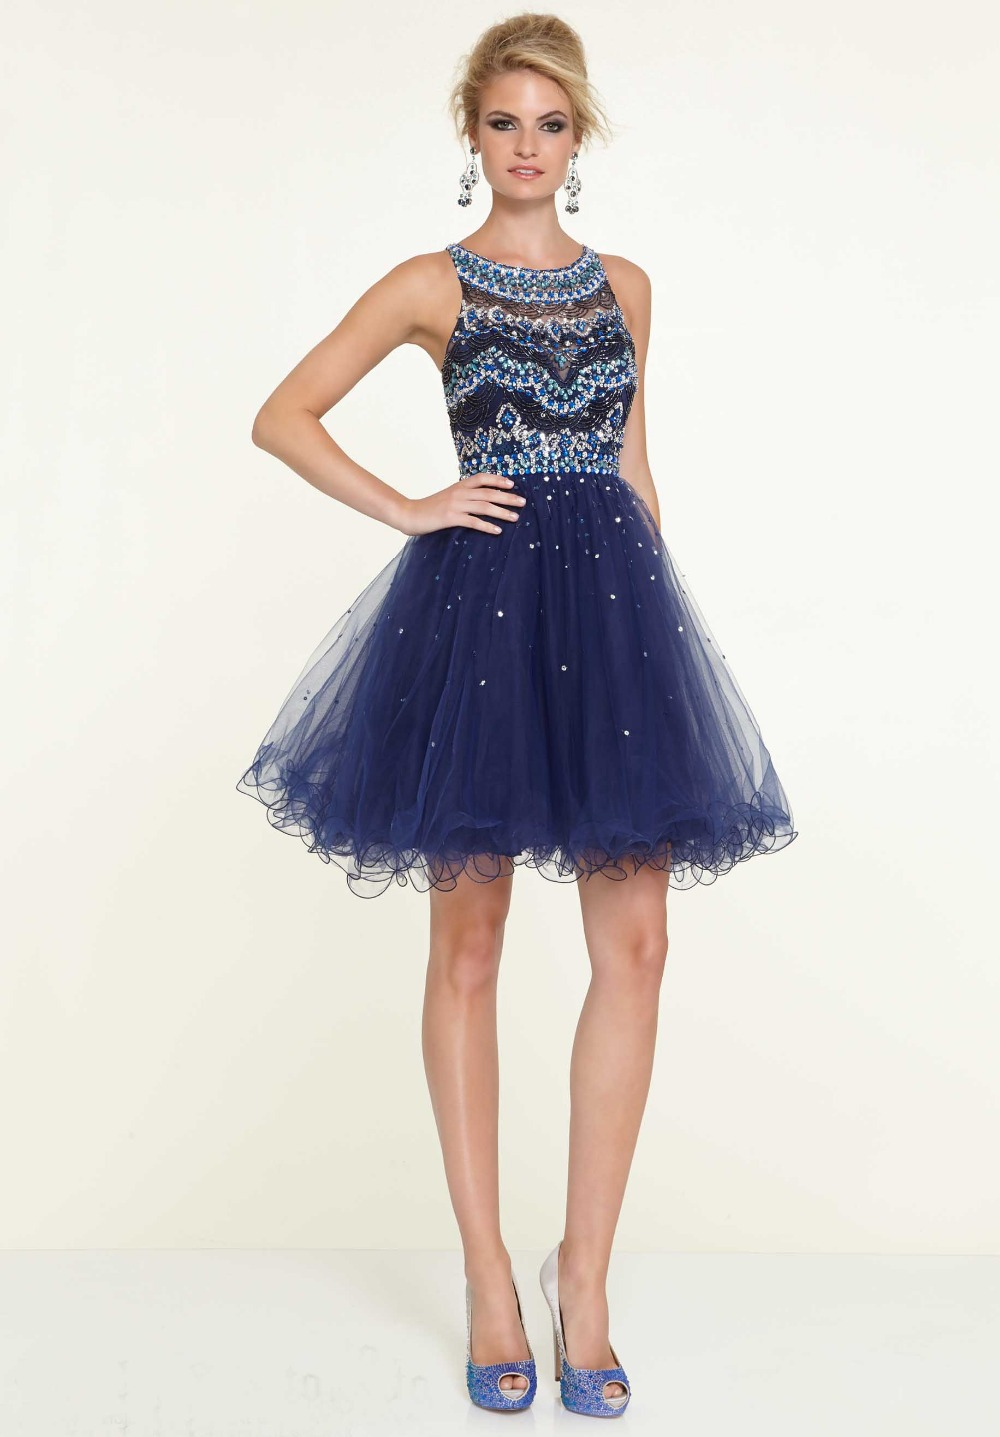 Short Navy Blue Dresses